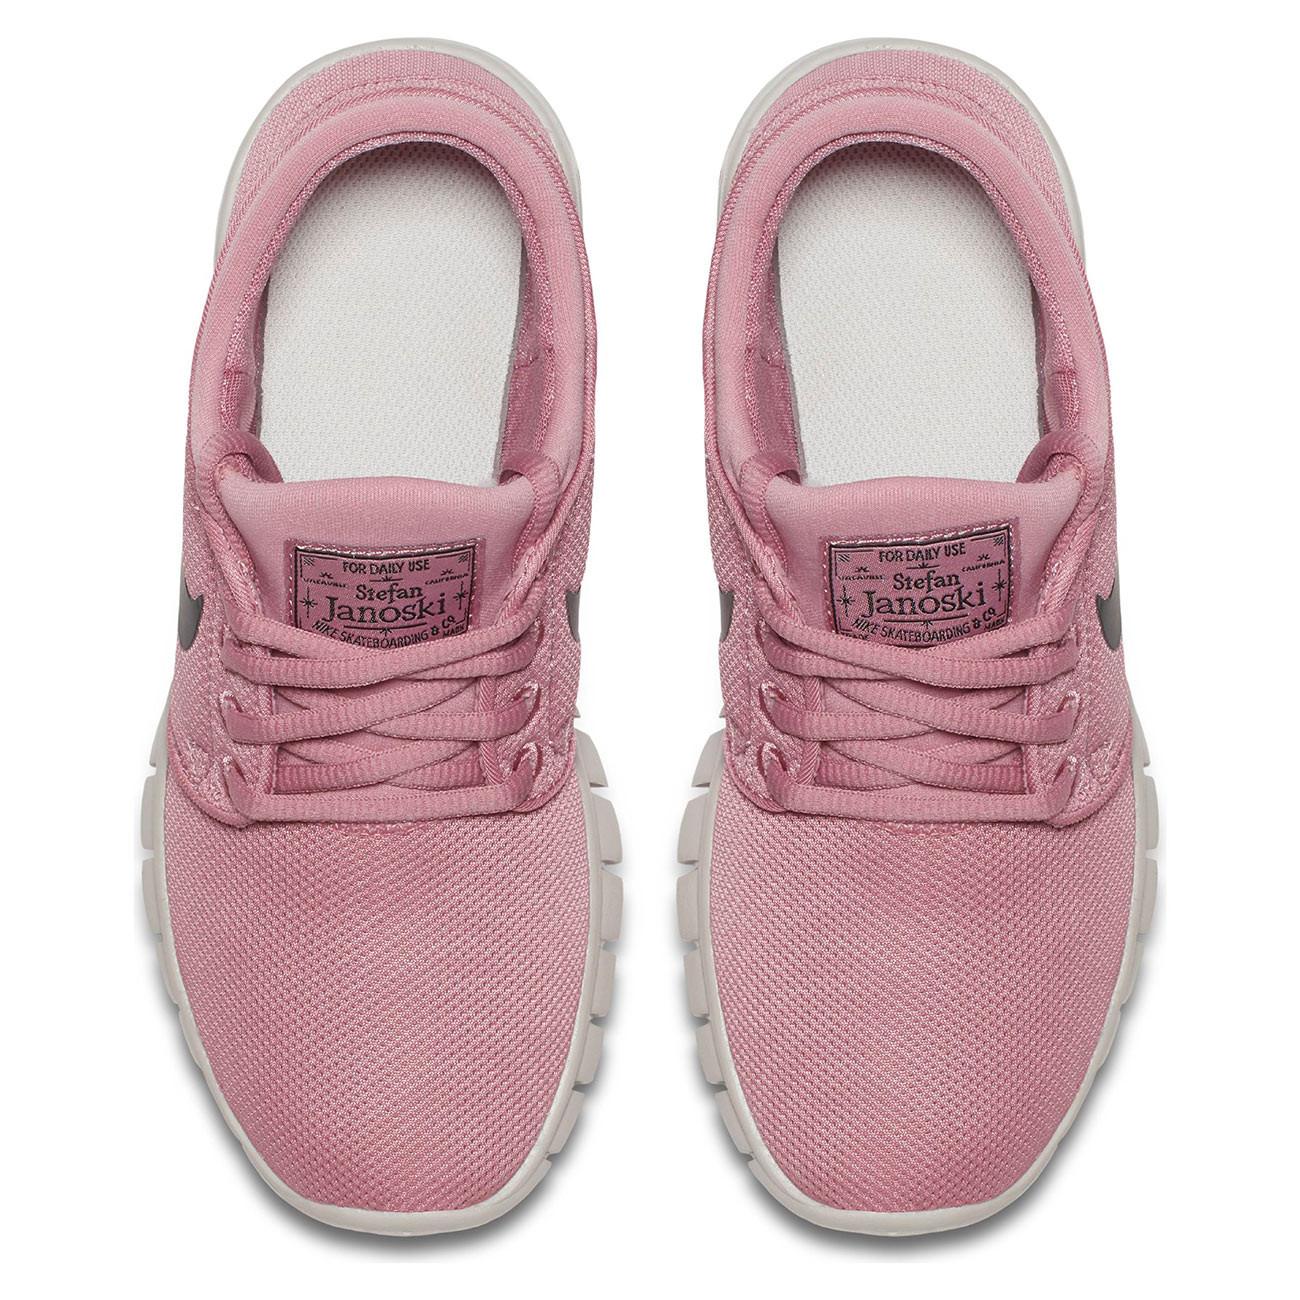 74ba72a26b1 Sneakers Nike SB Stefan Janoski Max (Gs) elmntl pink black-gum med ...